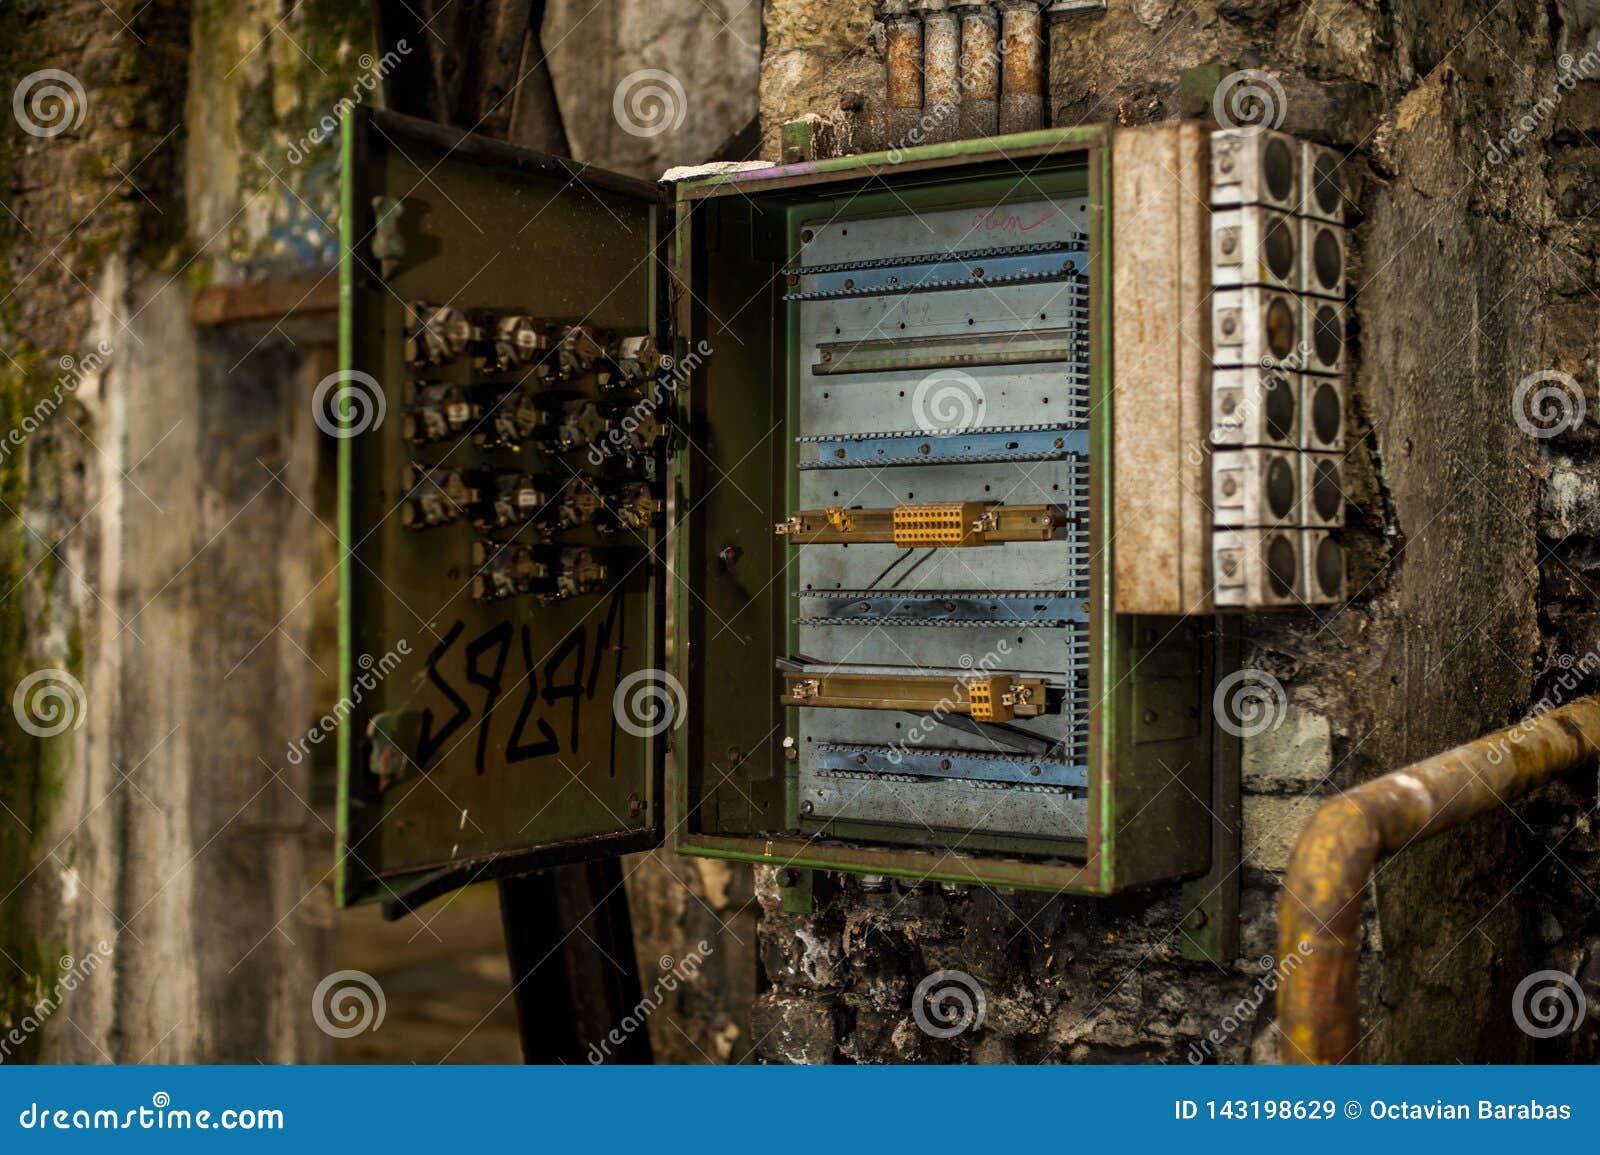 Fuse Box Lock - Catalogue of Schemas Open Fuse Box F on